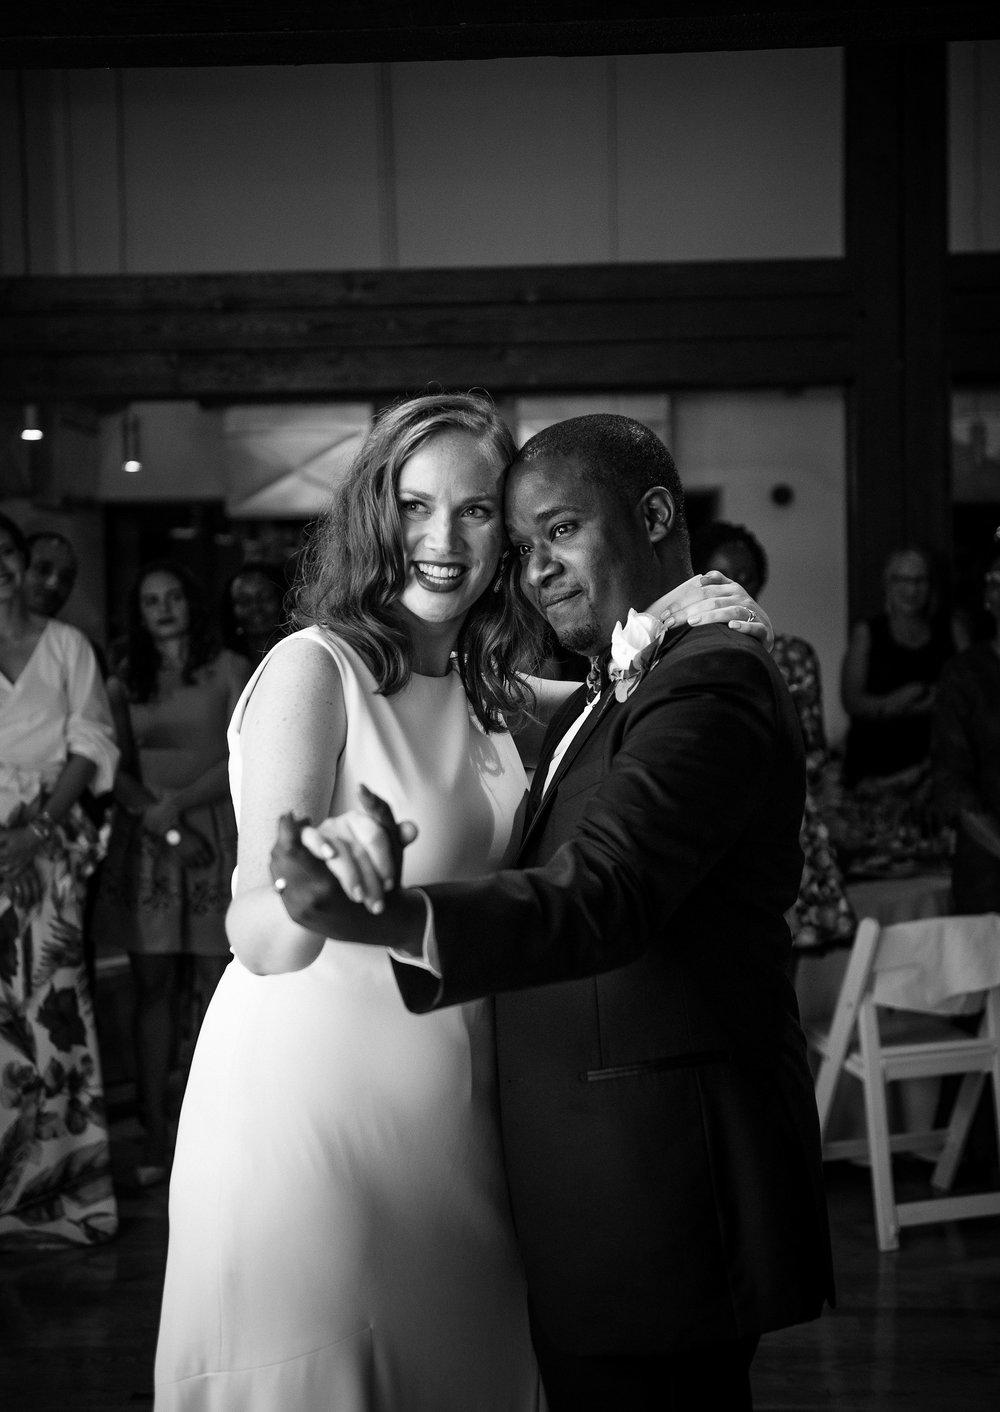 Christine_and_Leon_wedding_lana_nimmons_photography10677.jpg